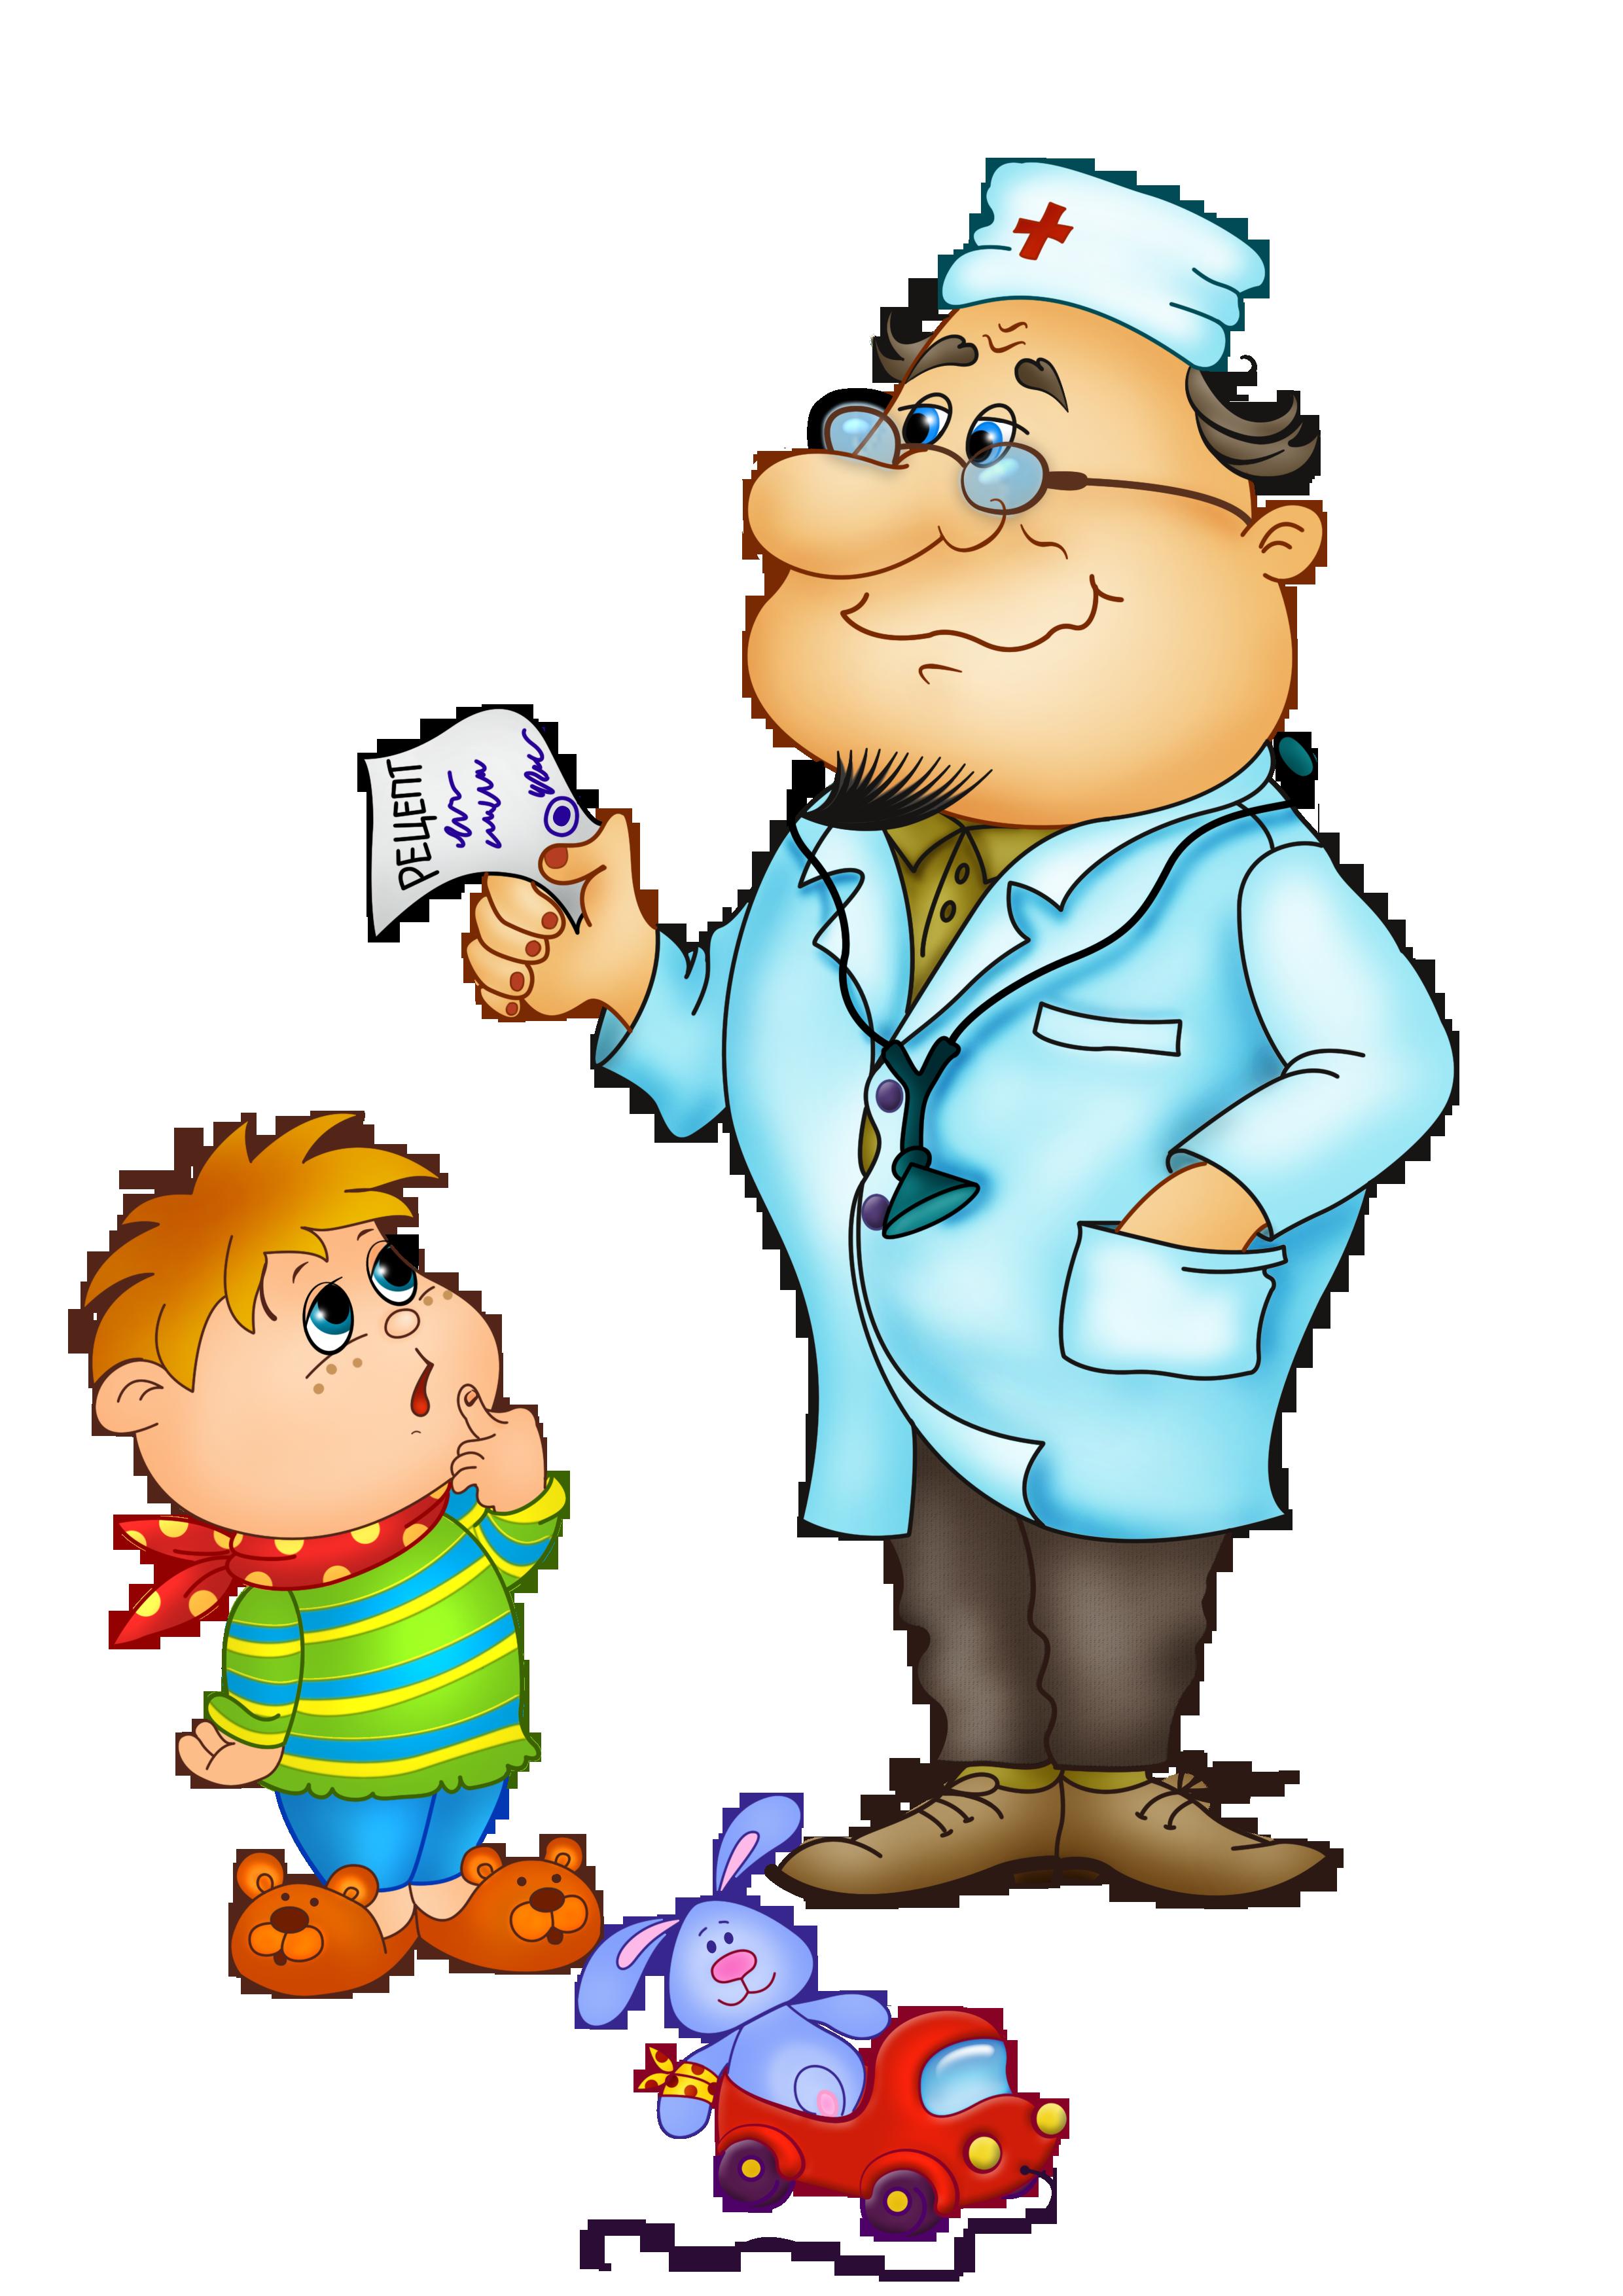 Доктор картинки для детей на прозрачном фоне